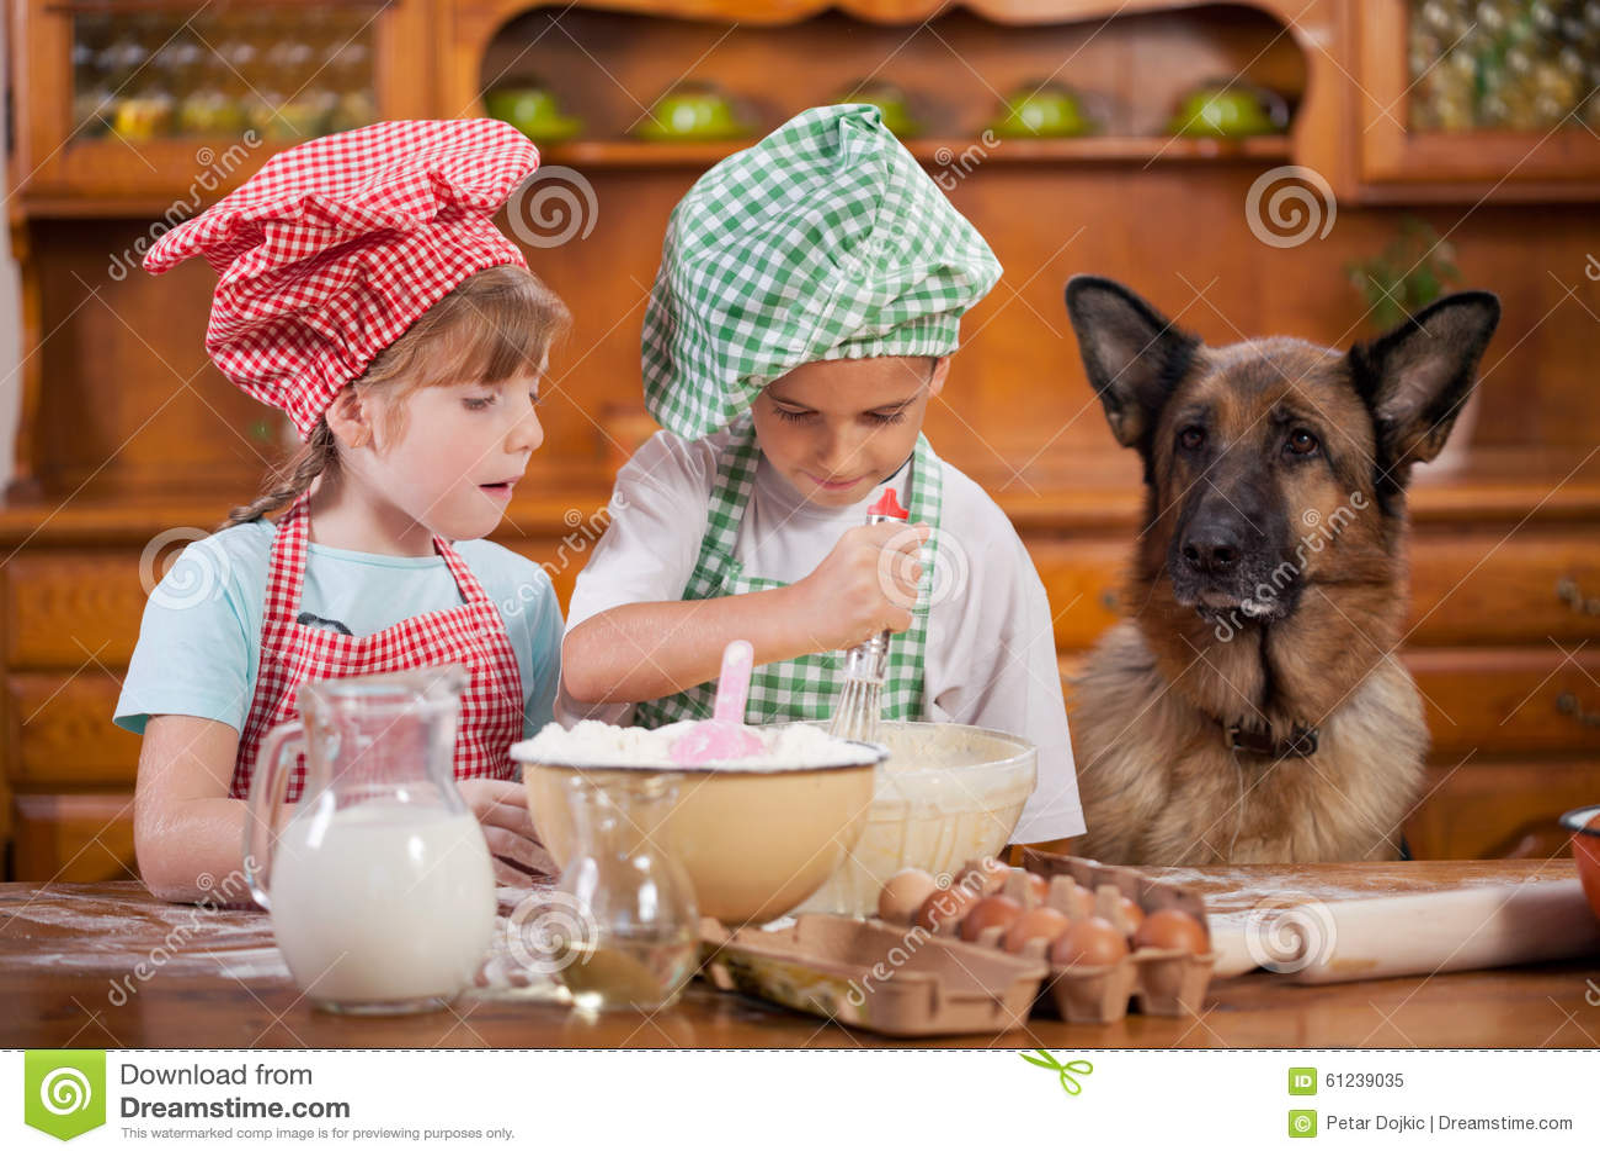 Twee kleine chef koks die van in de keuken genieten die groot maken knoeien duits stock foto - Foto van kleine keuken amenagee ...